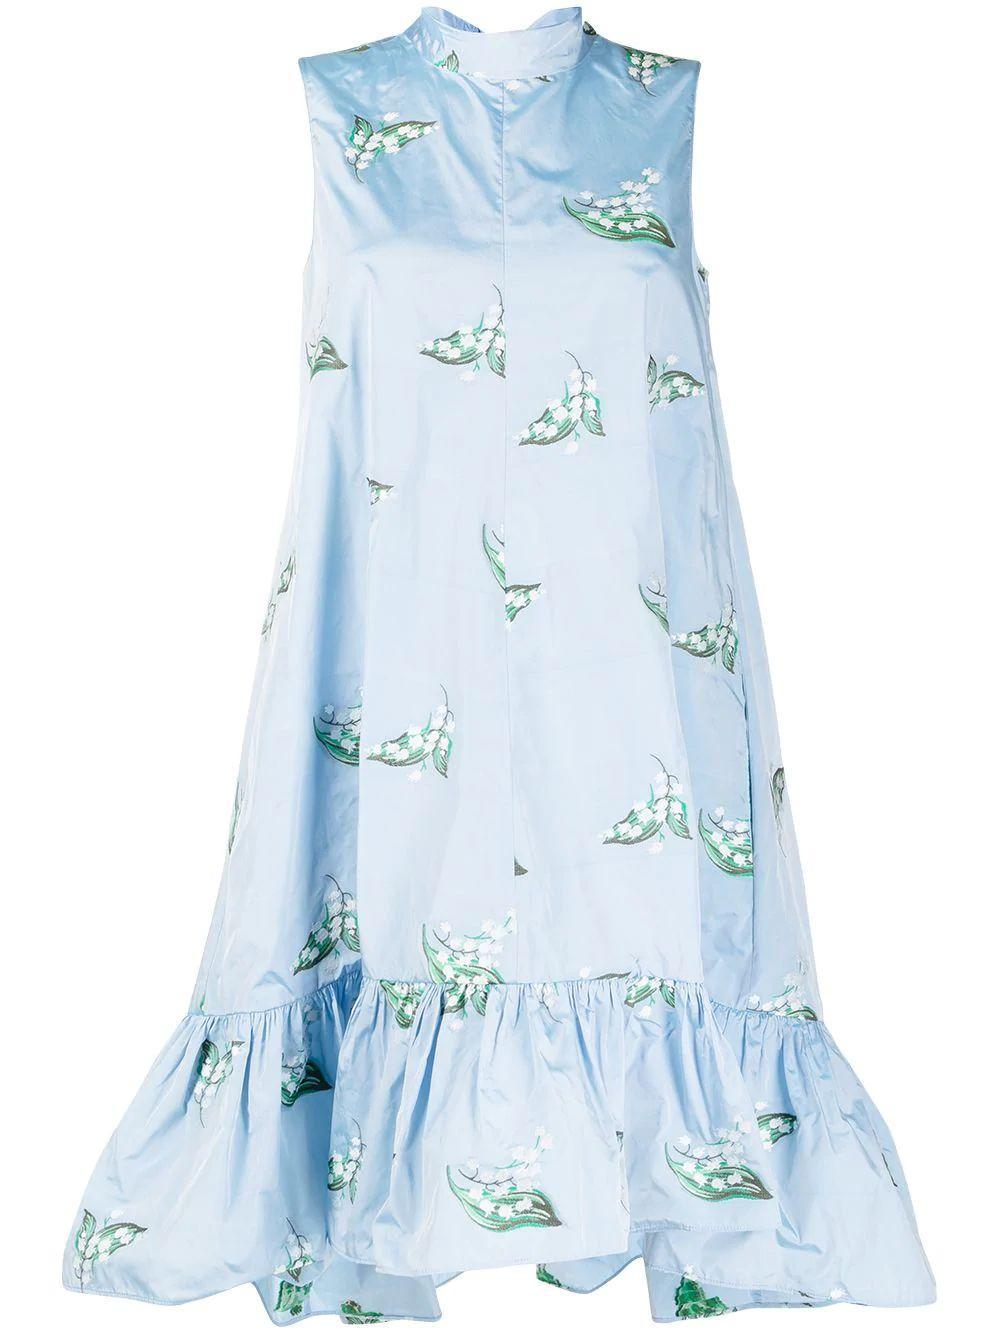 May Lily- Motif Day Dress Item # VR3VAY355M7